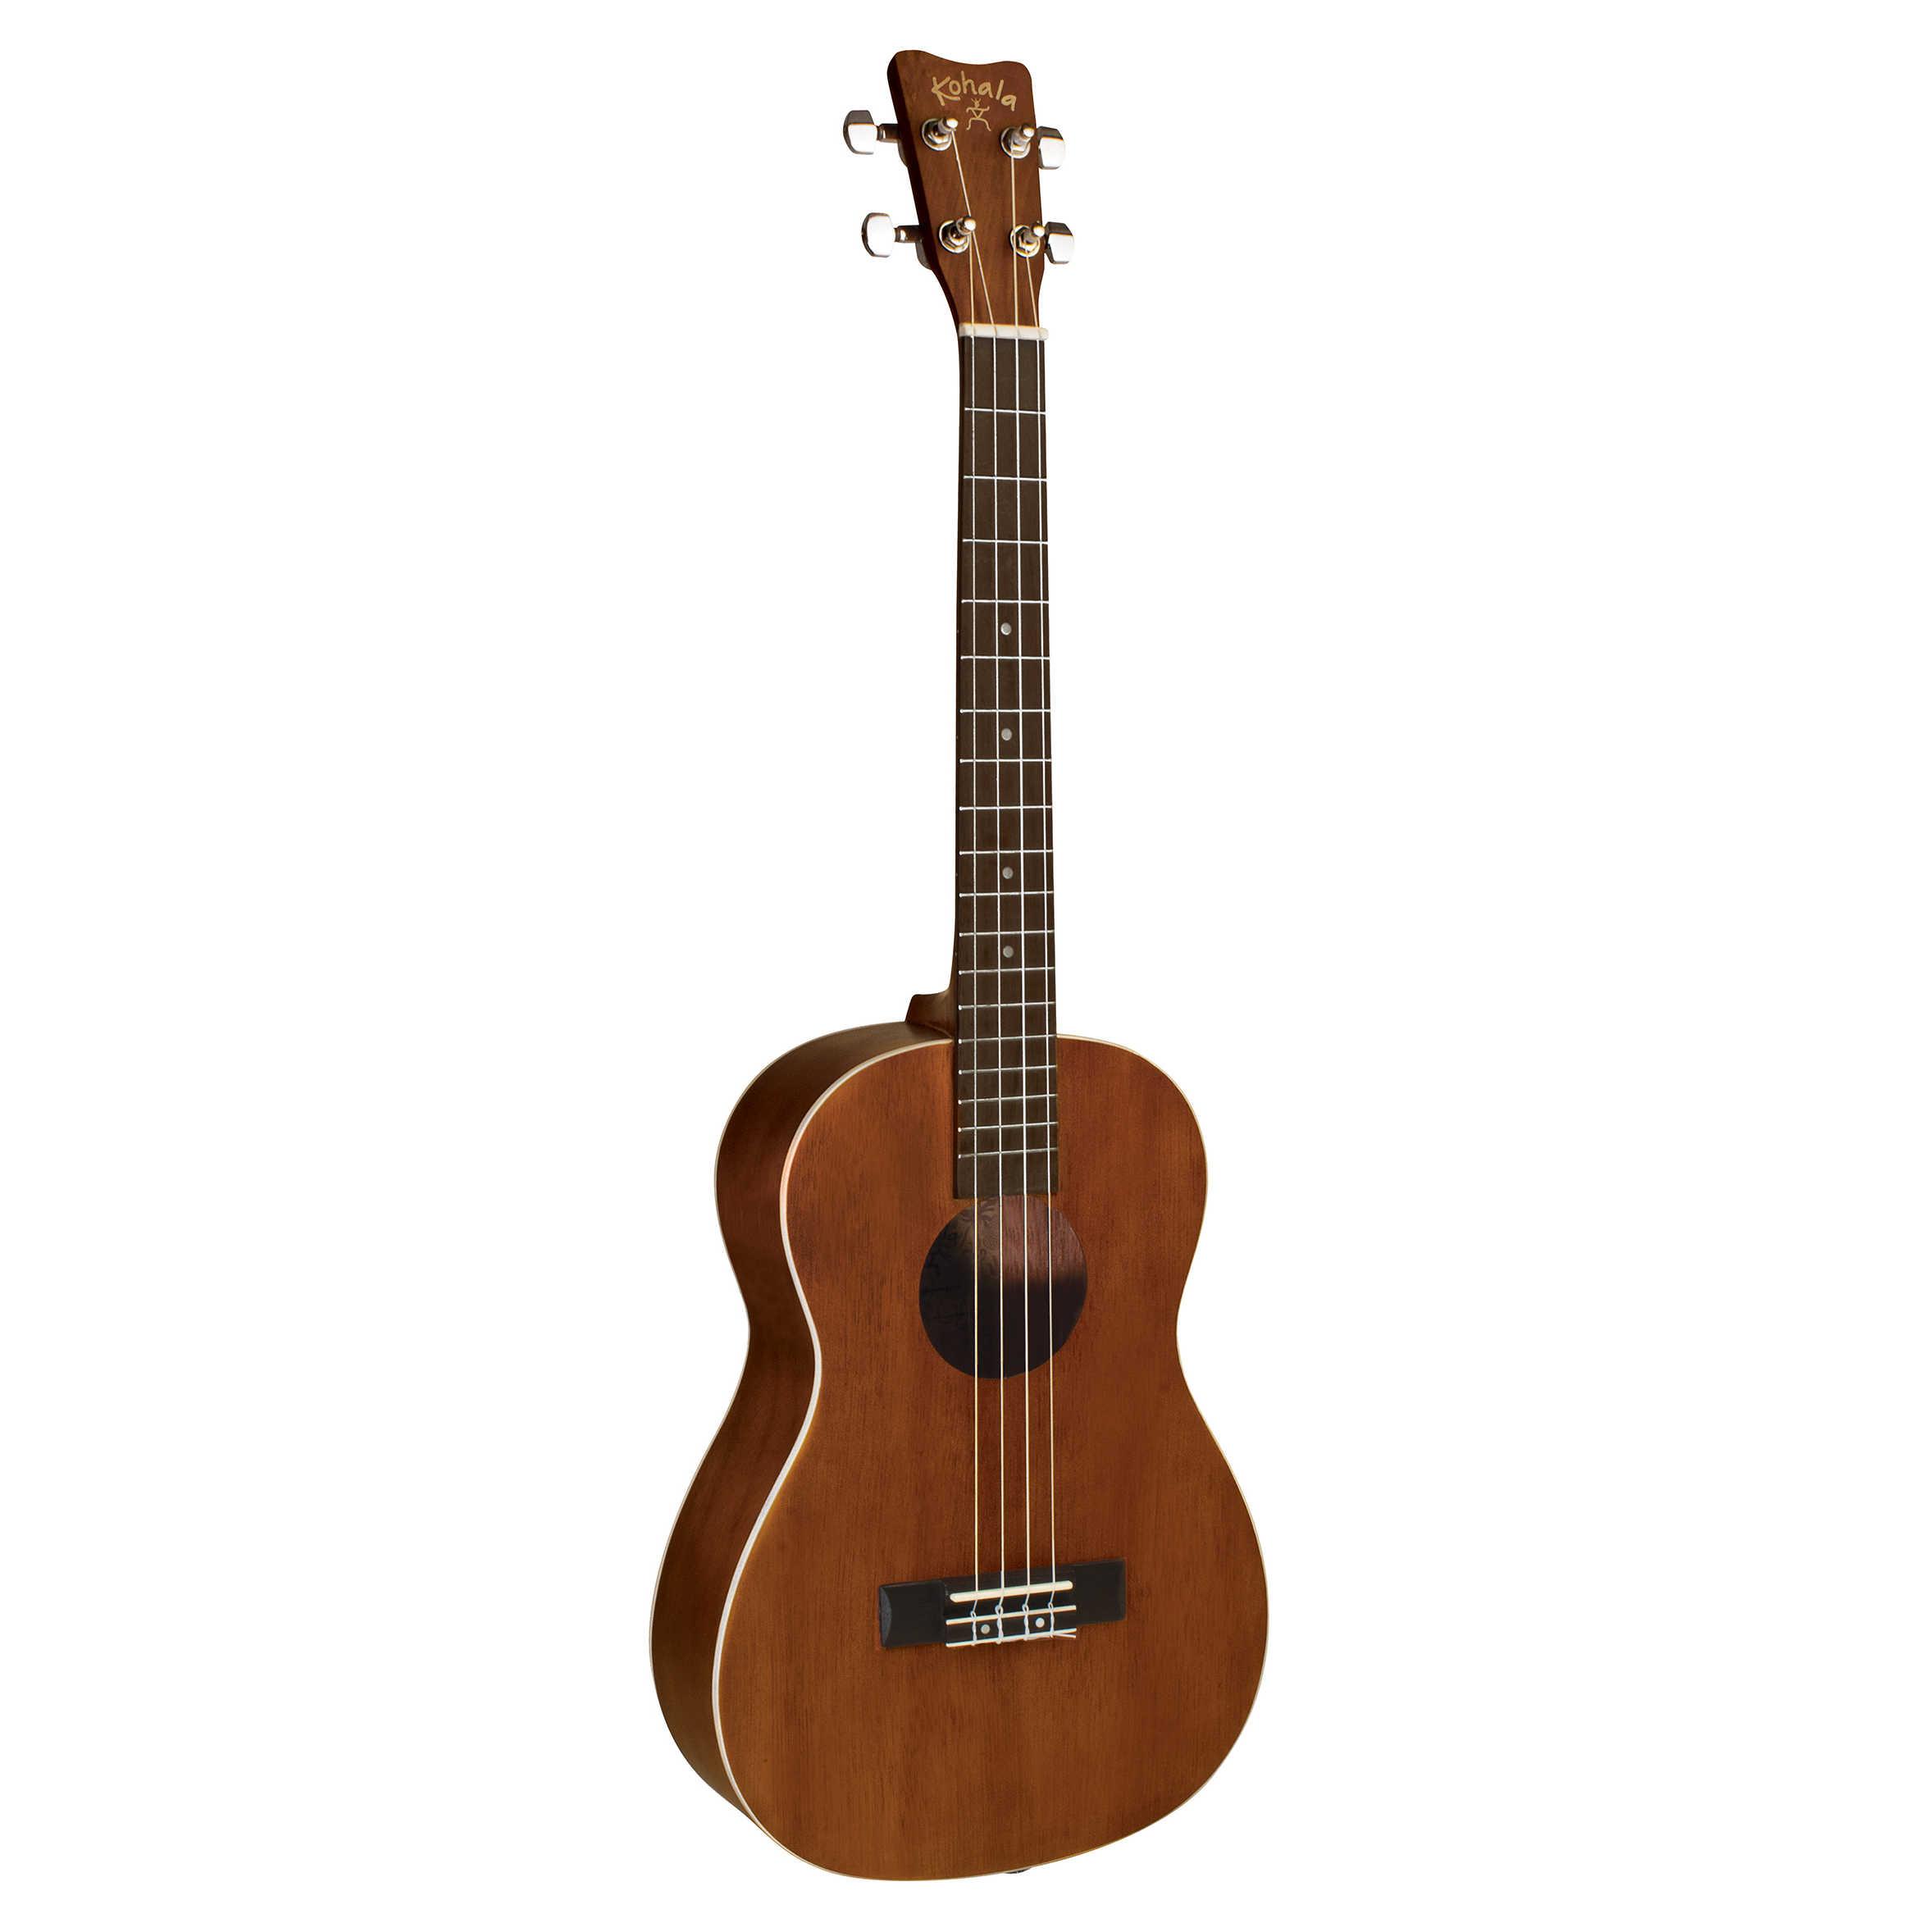 Kohala AK-BAE Akamai Baritone Acoustic-Electric Ukulele